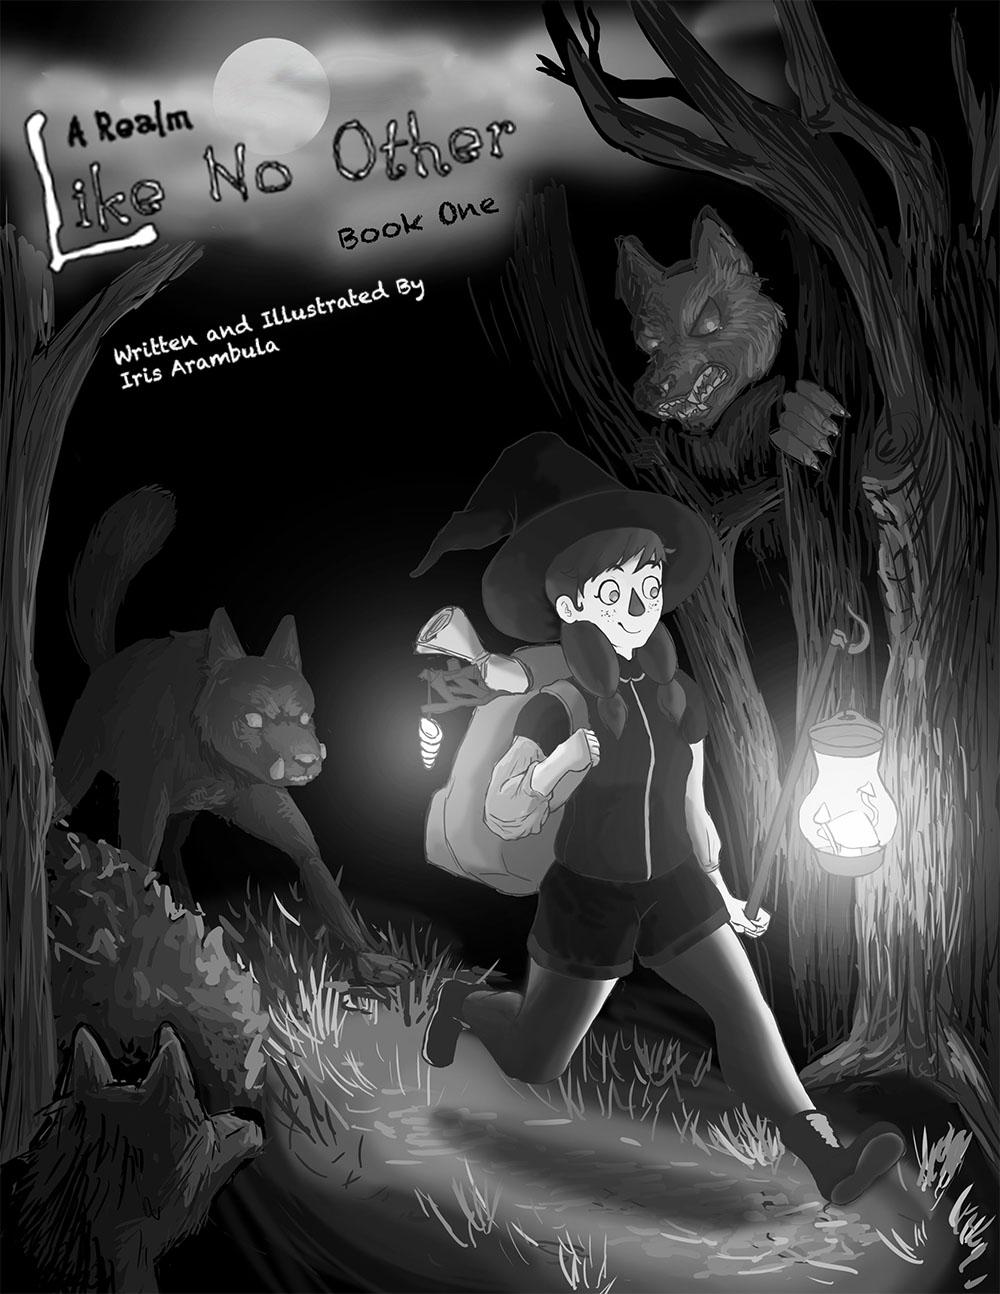 Book 1: Cover